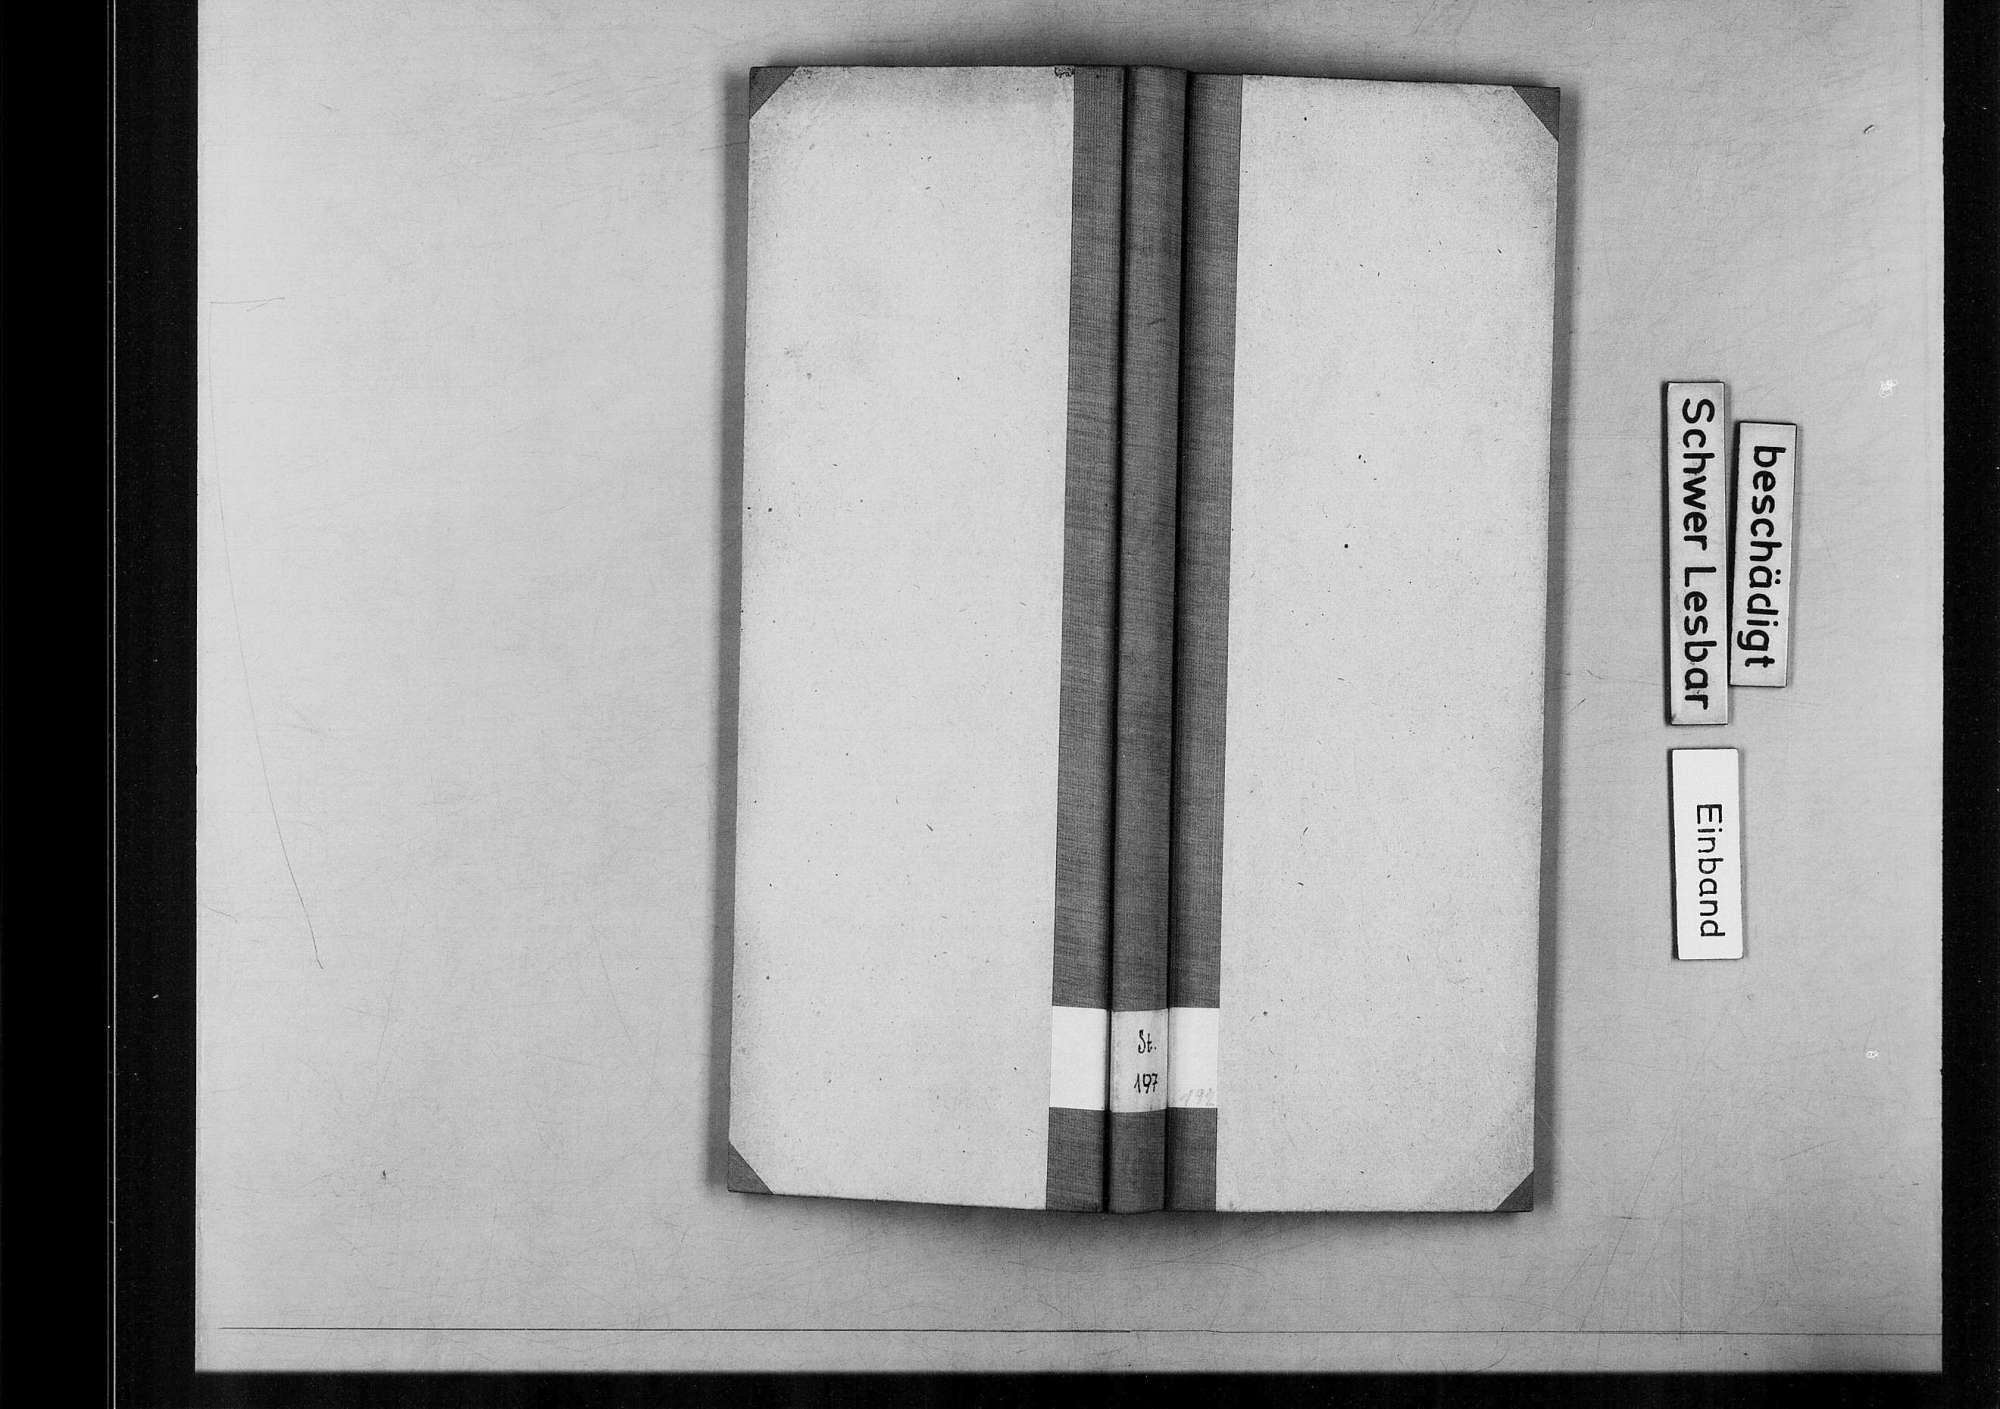 Leonberg, Bild 1